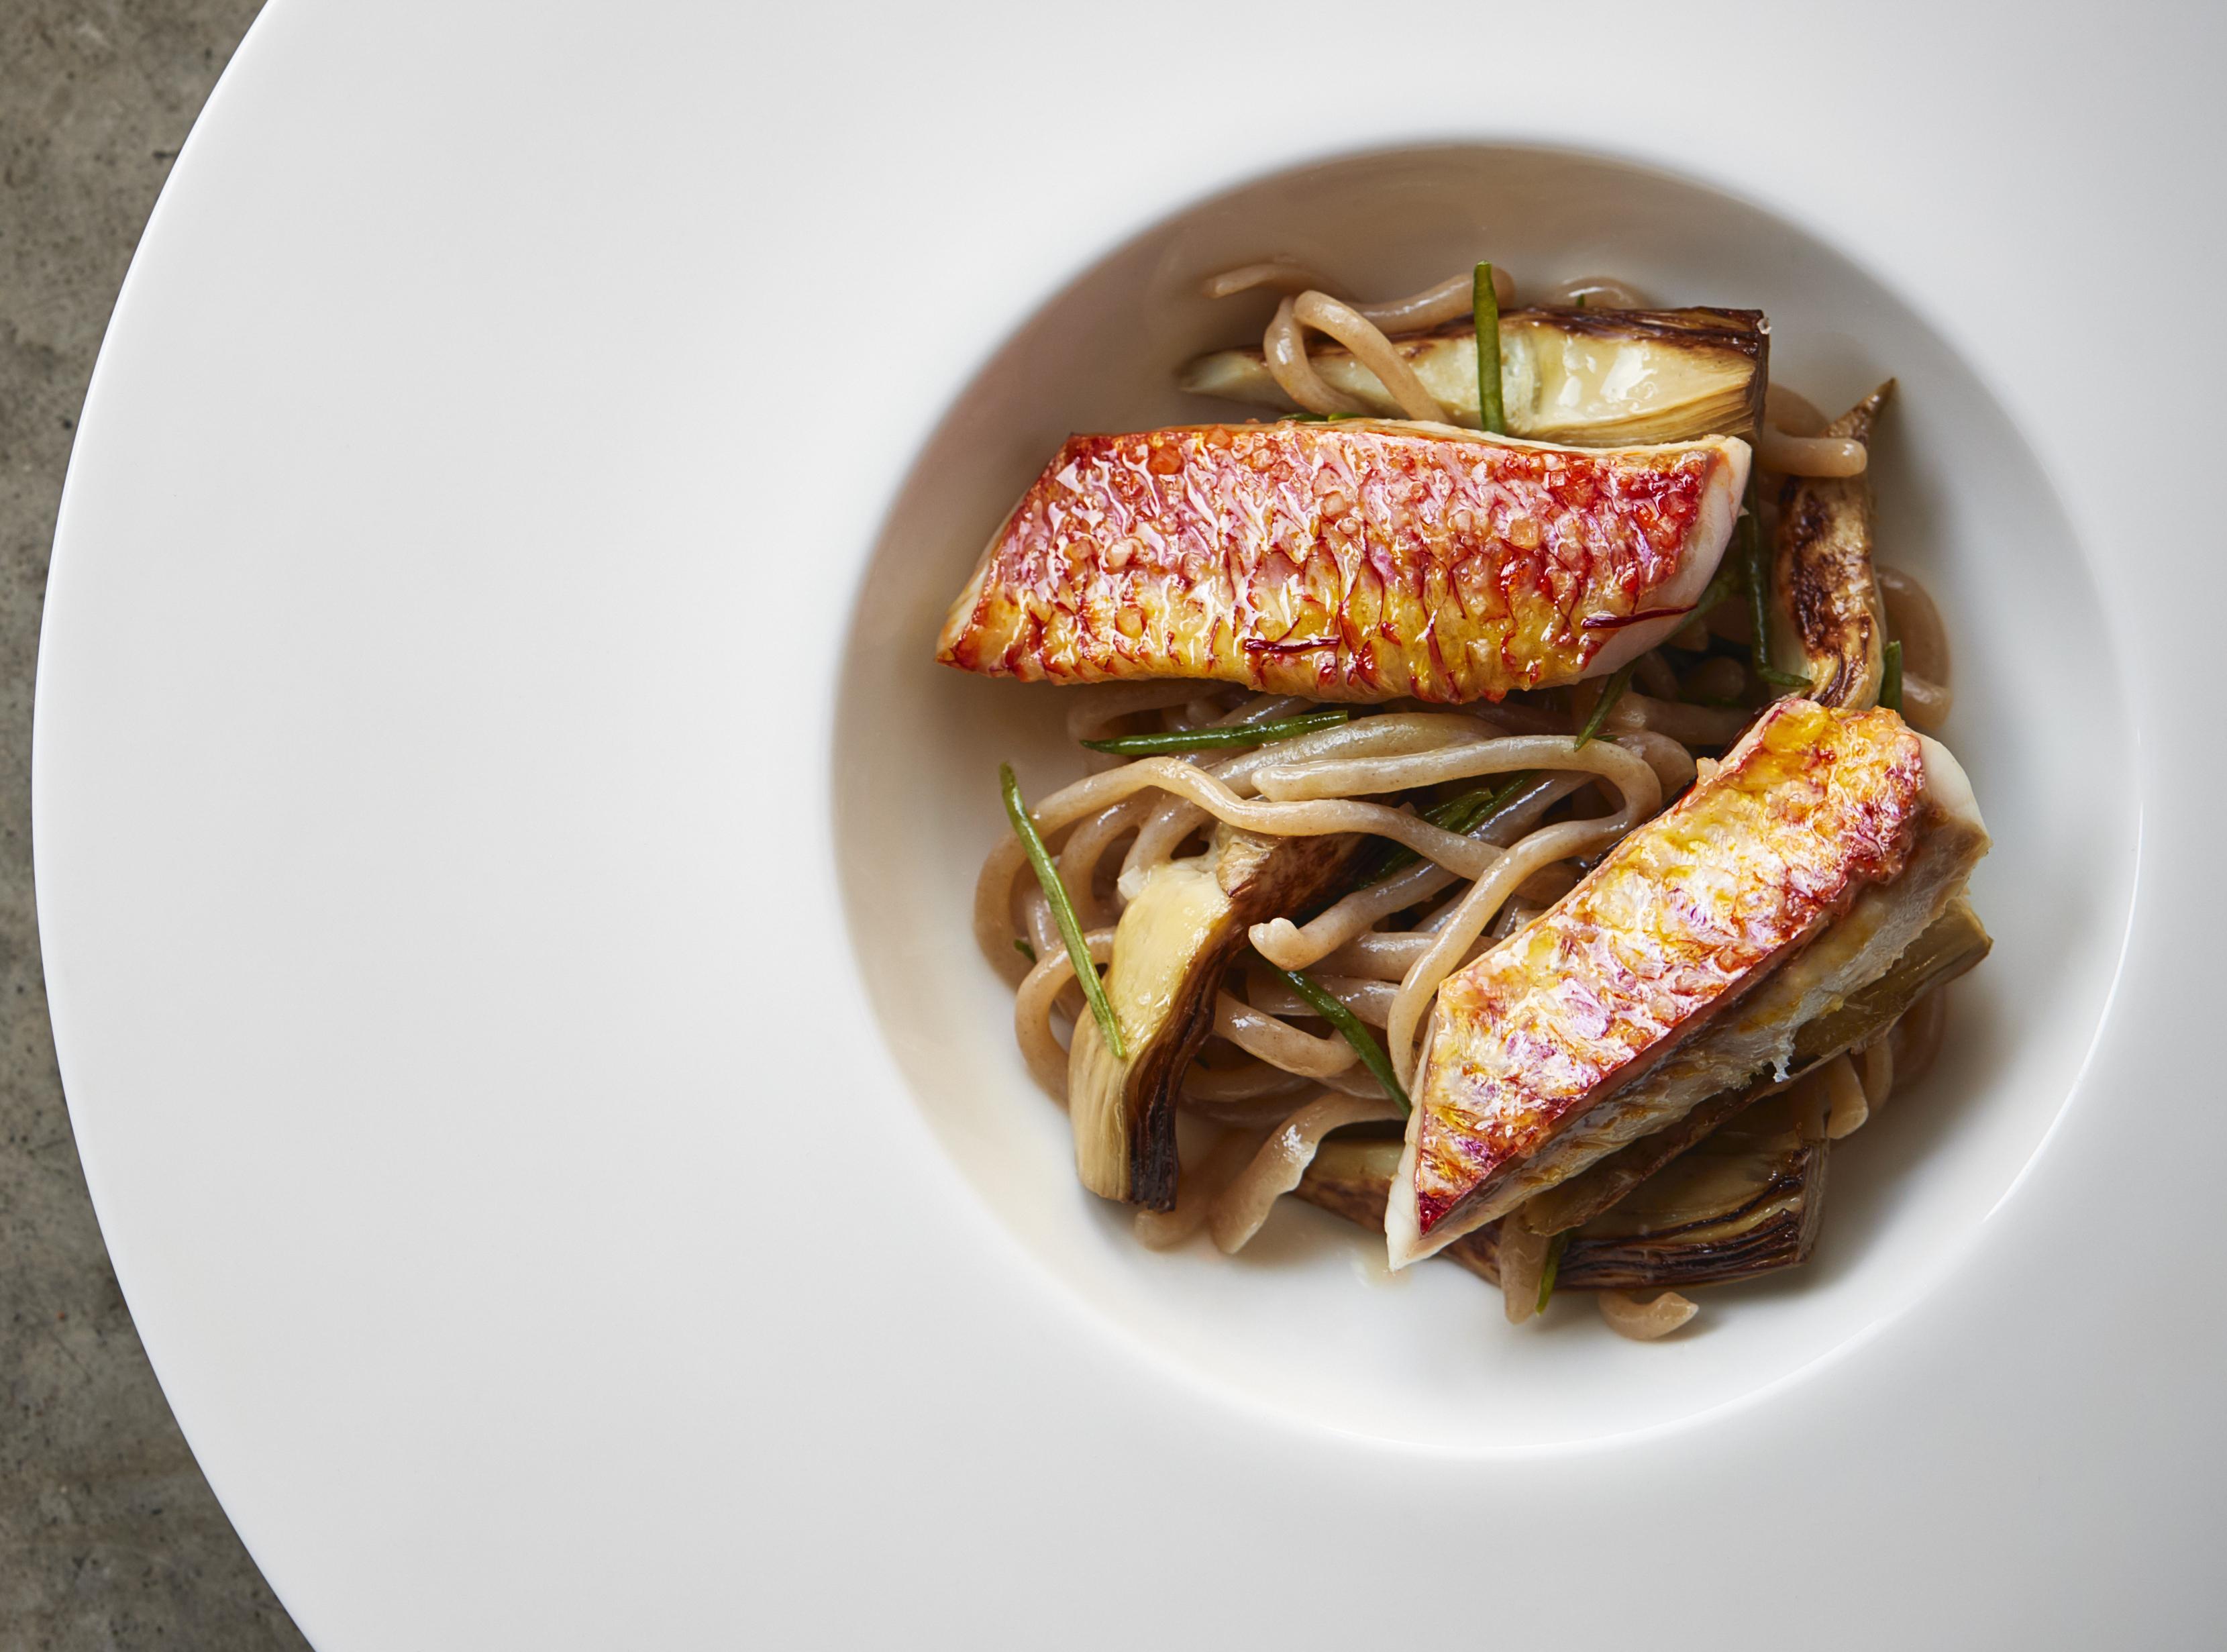 New London Bridge Restaurant From Heston Blumenthal Alumni Announces Opening Date